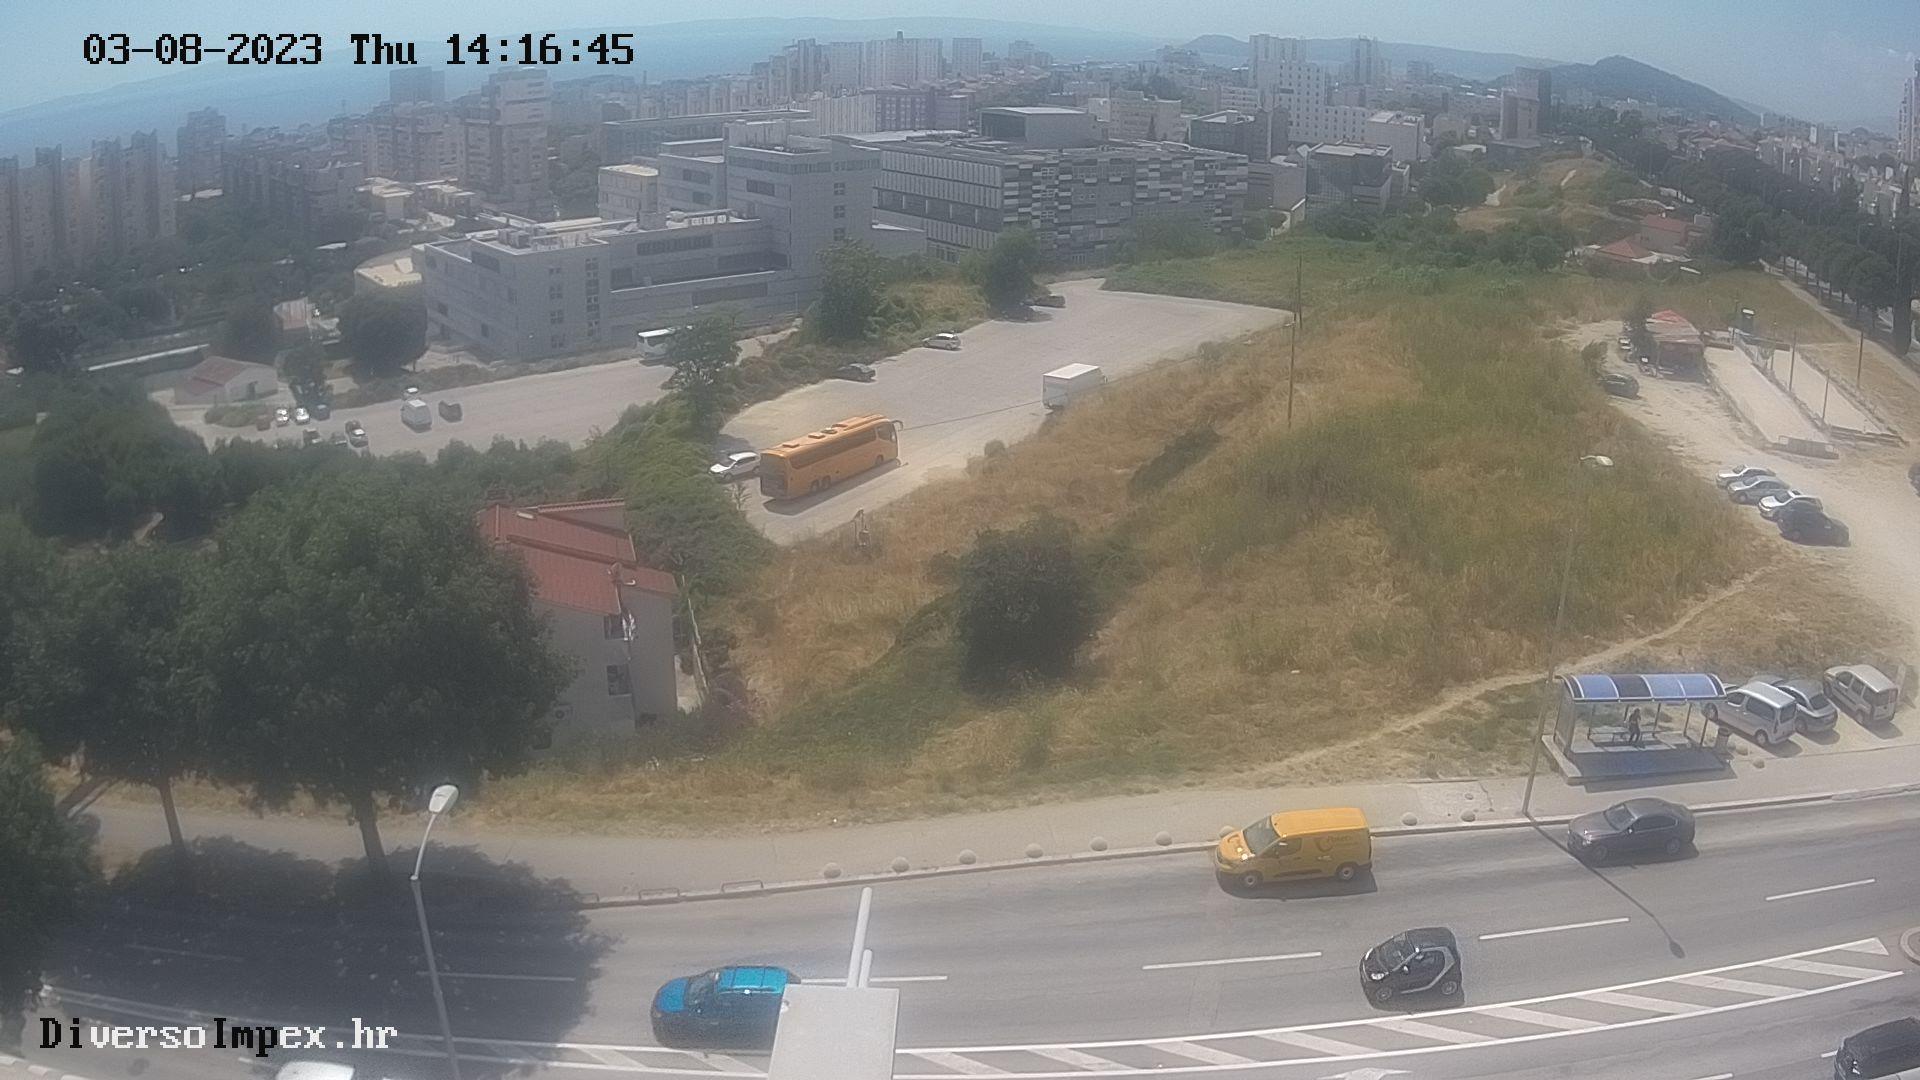 image from weather camera in Split - Croatia